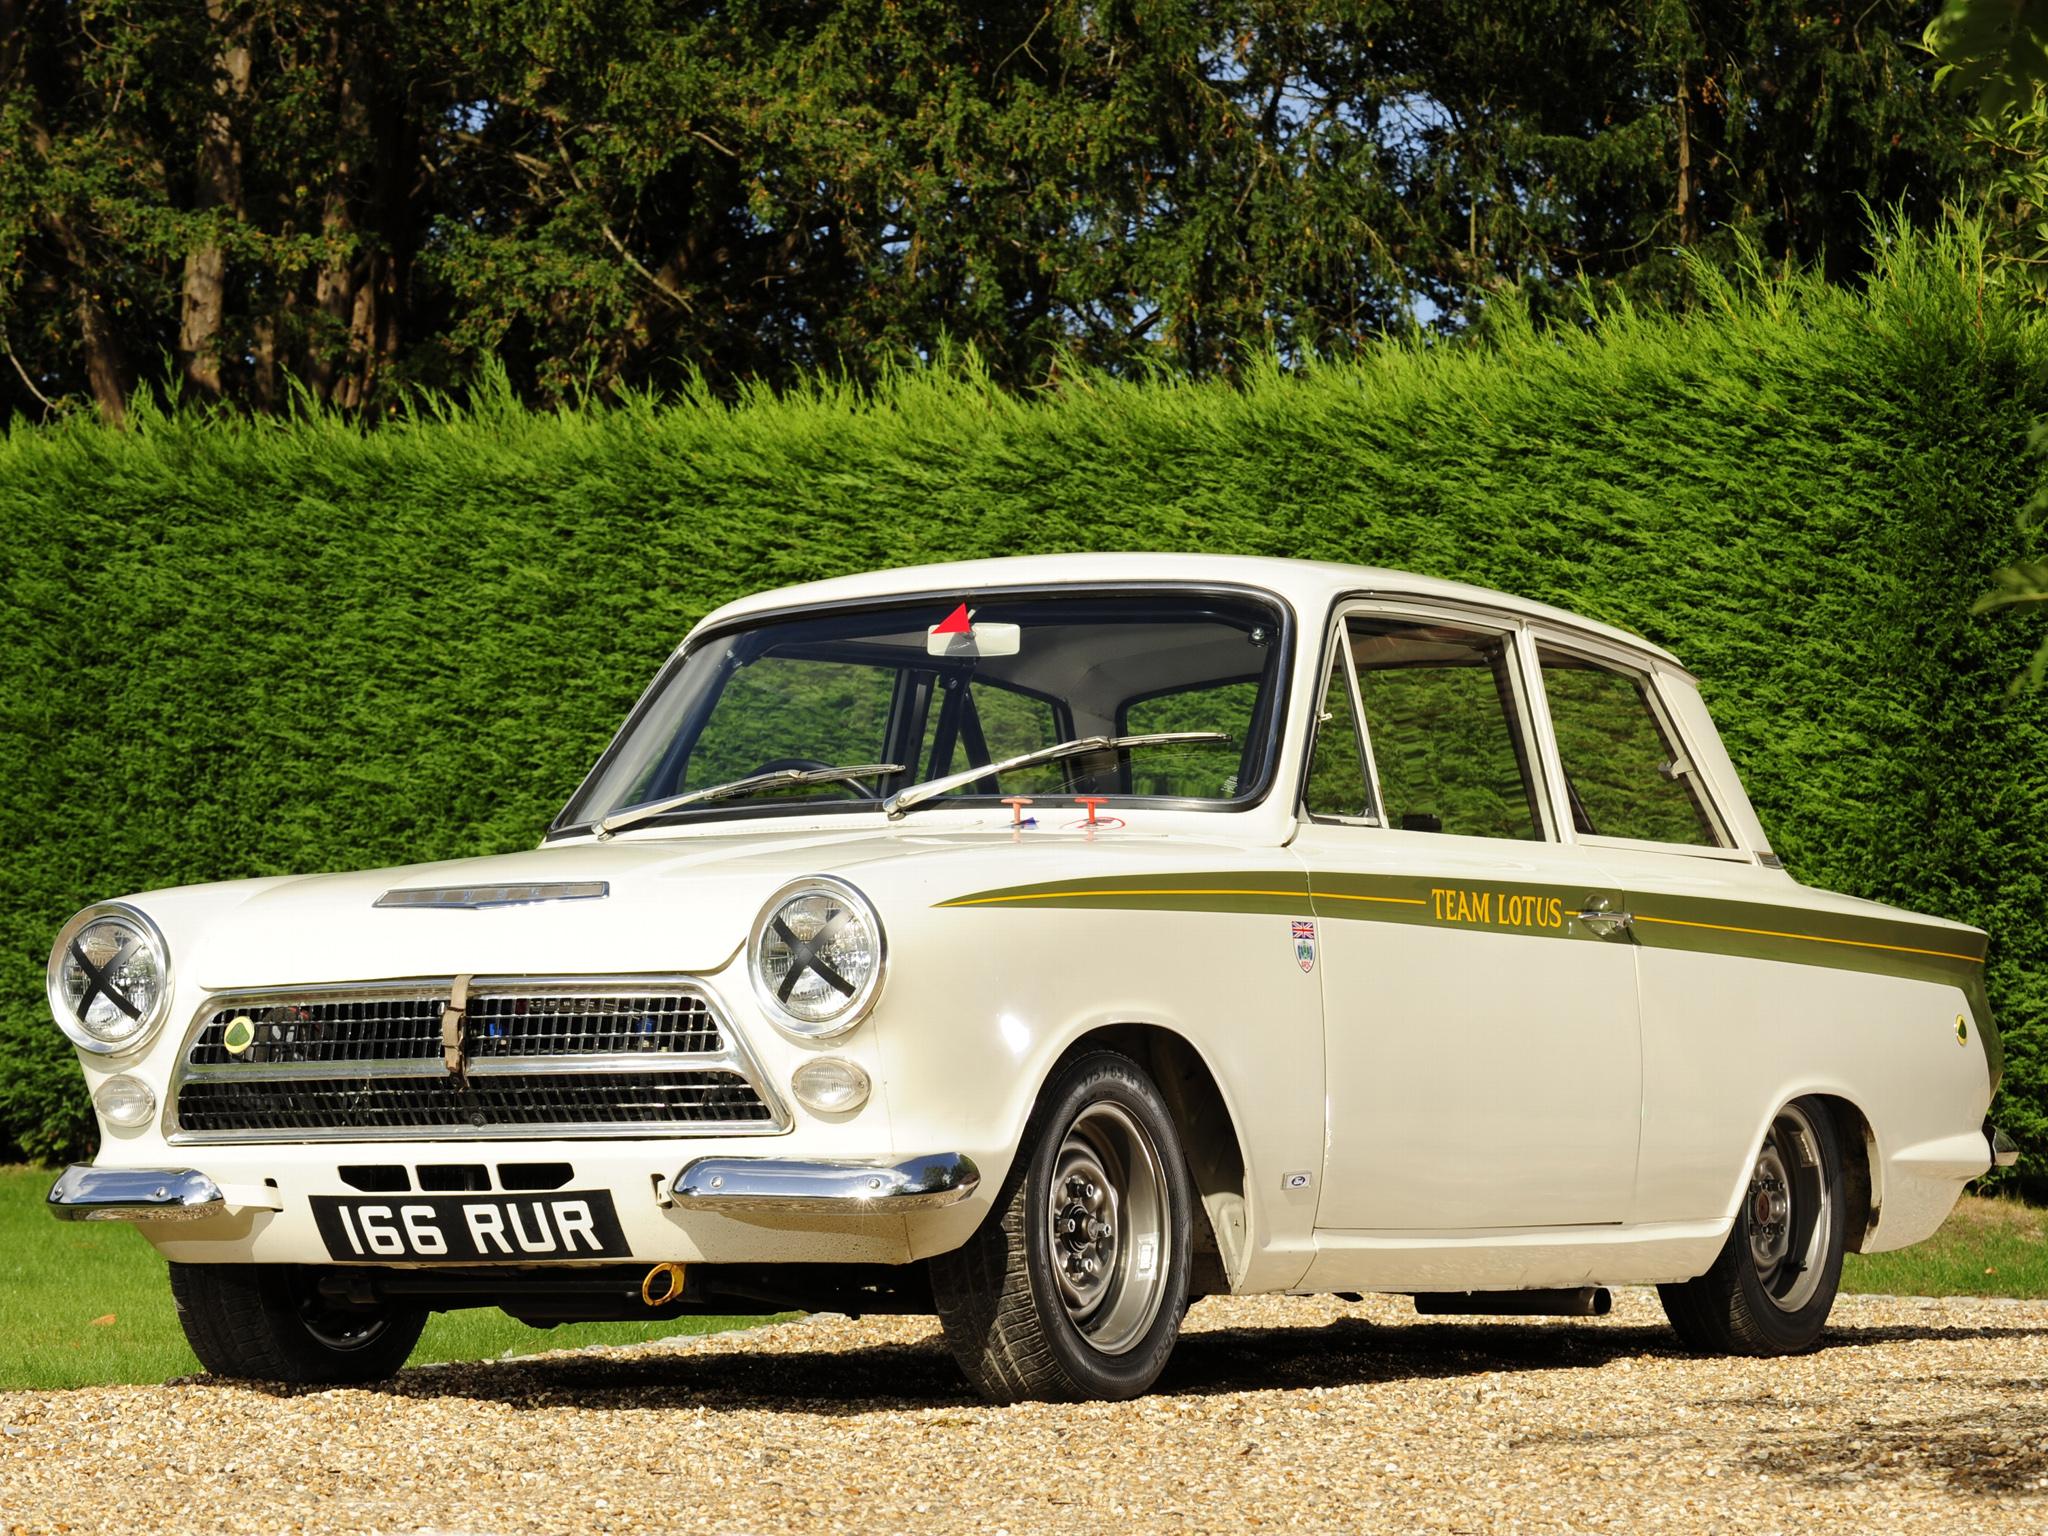 5 fords we re damn proud were built in britain. Black Bedroom Furniture Sets. Home Design Ideas